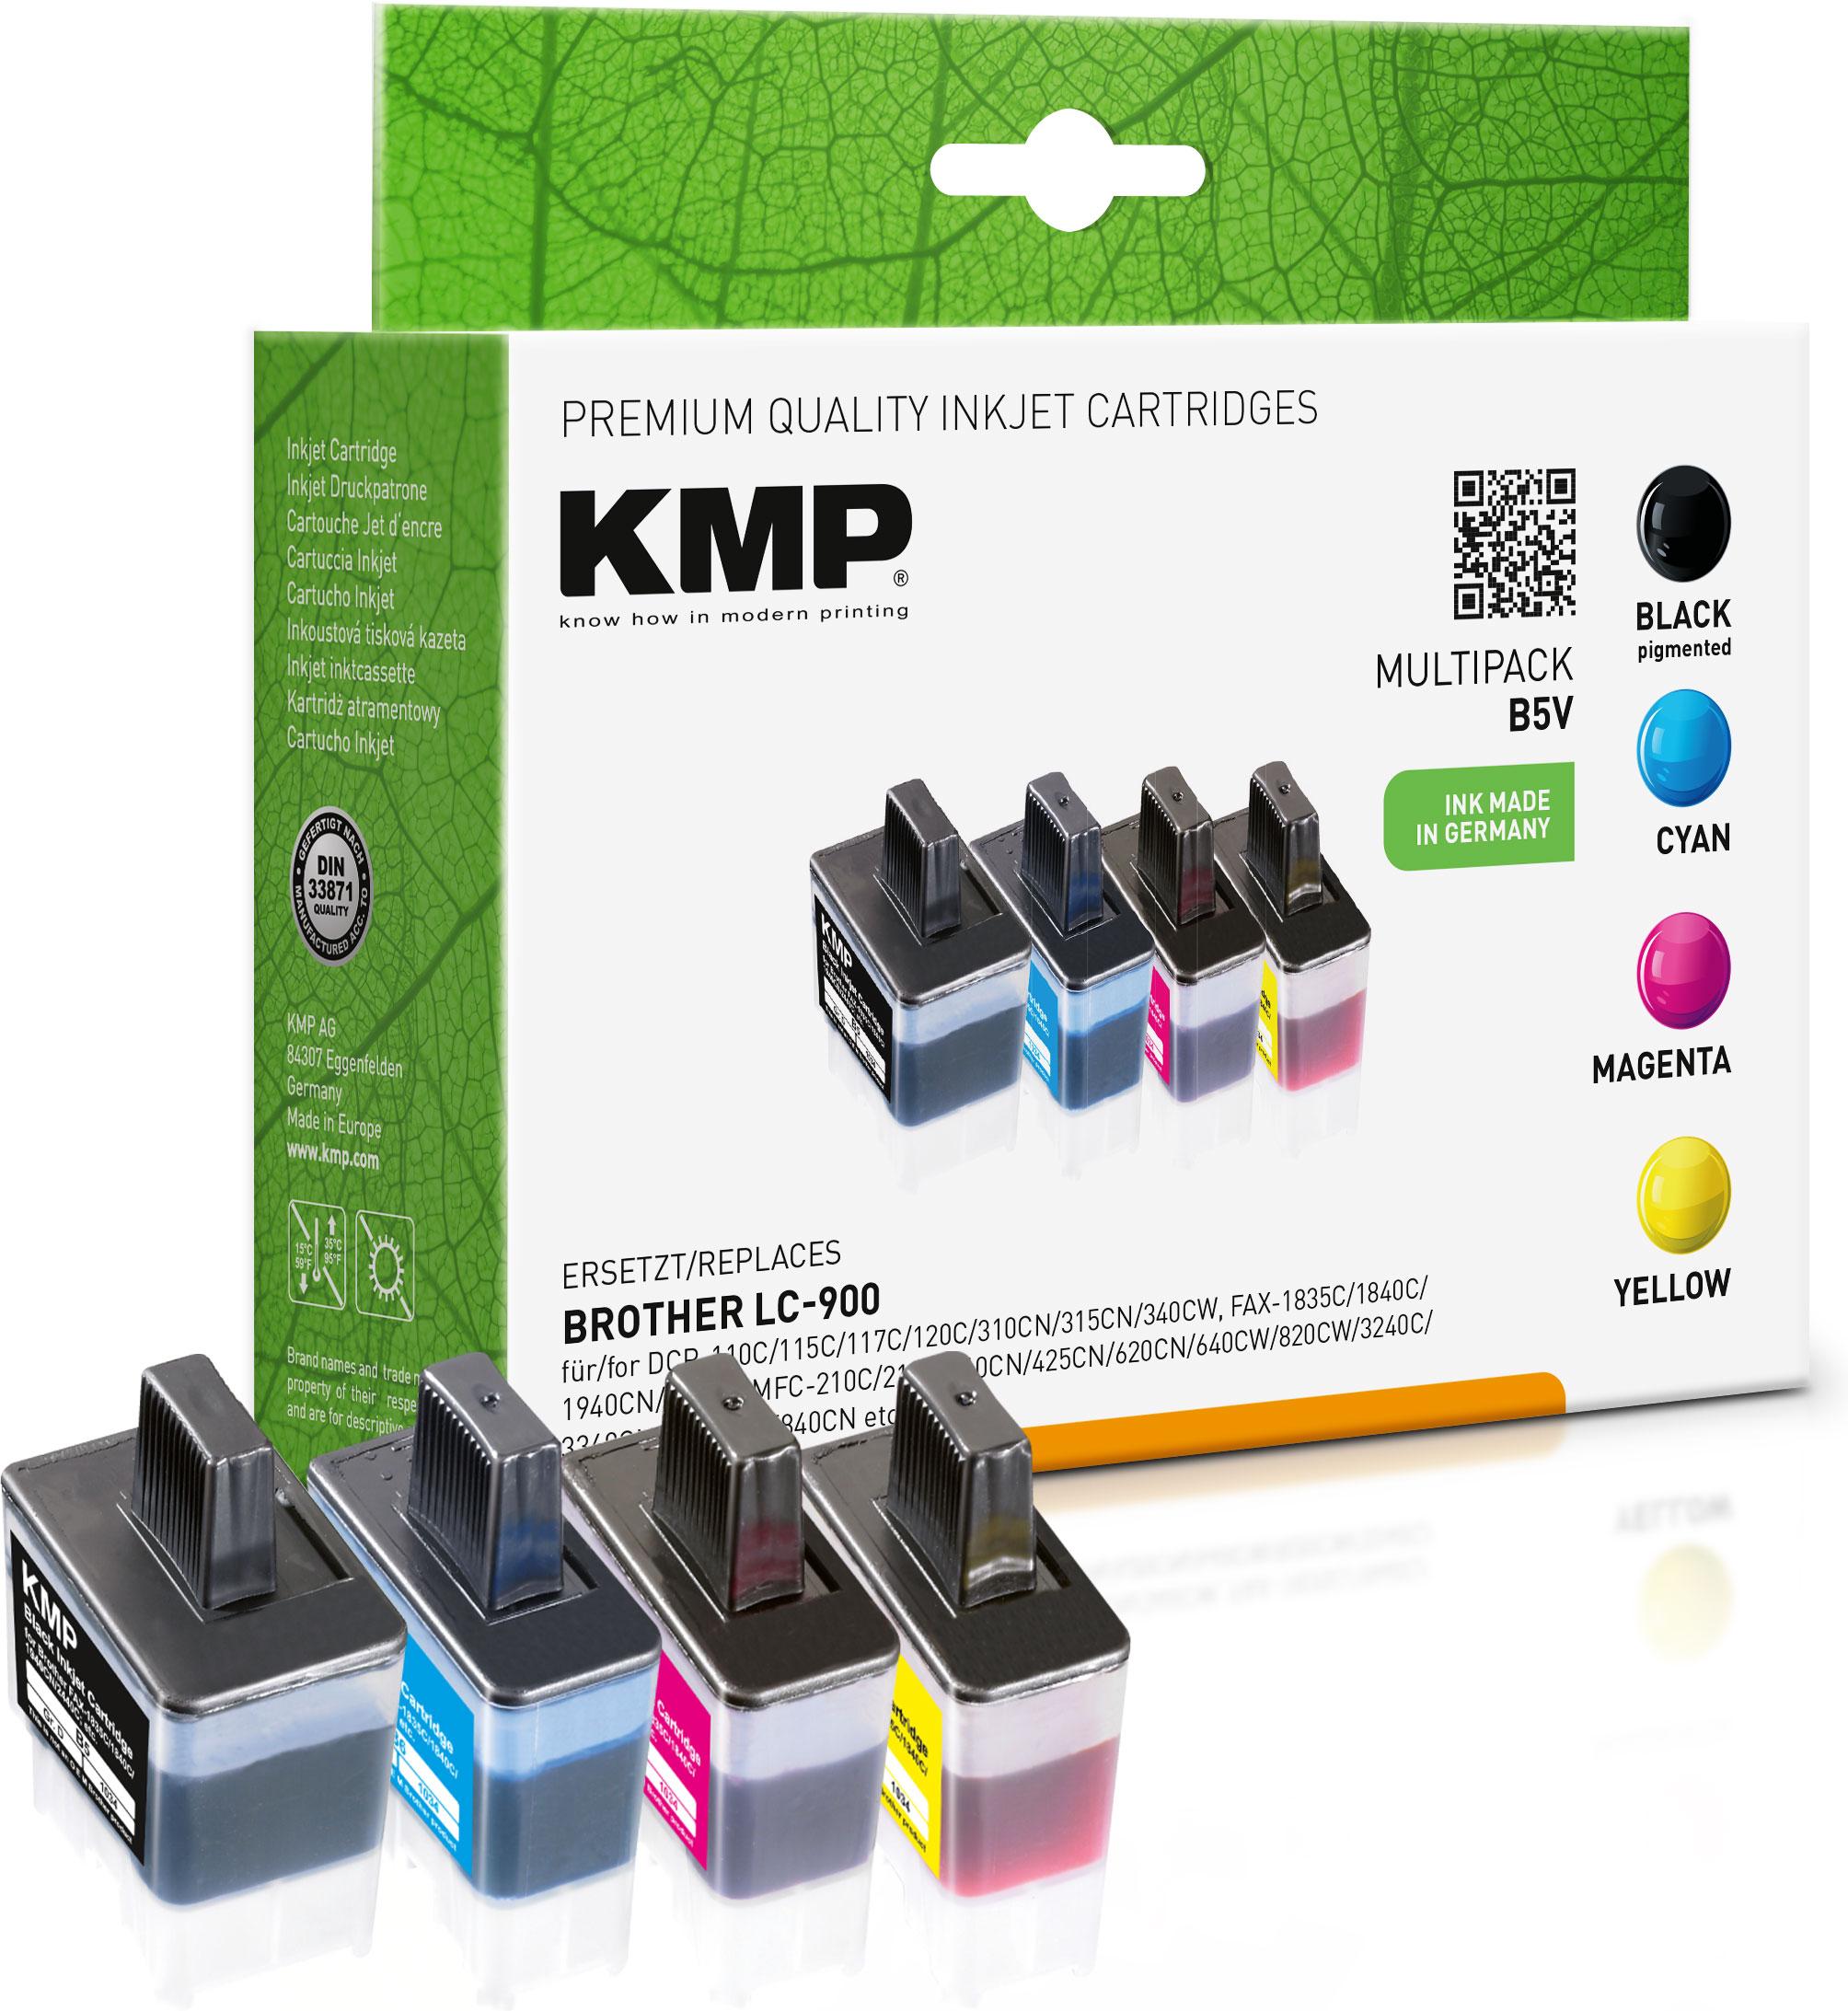 KMP Tintenpatrone gelb cyan magenta 2x schwarz (1034,0005, B5V)